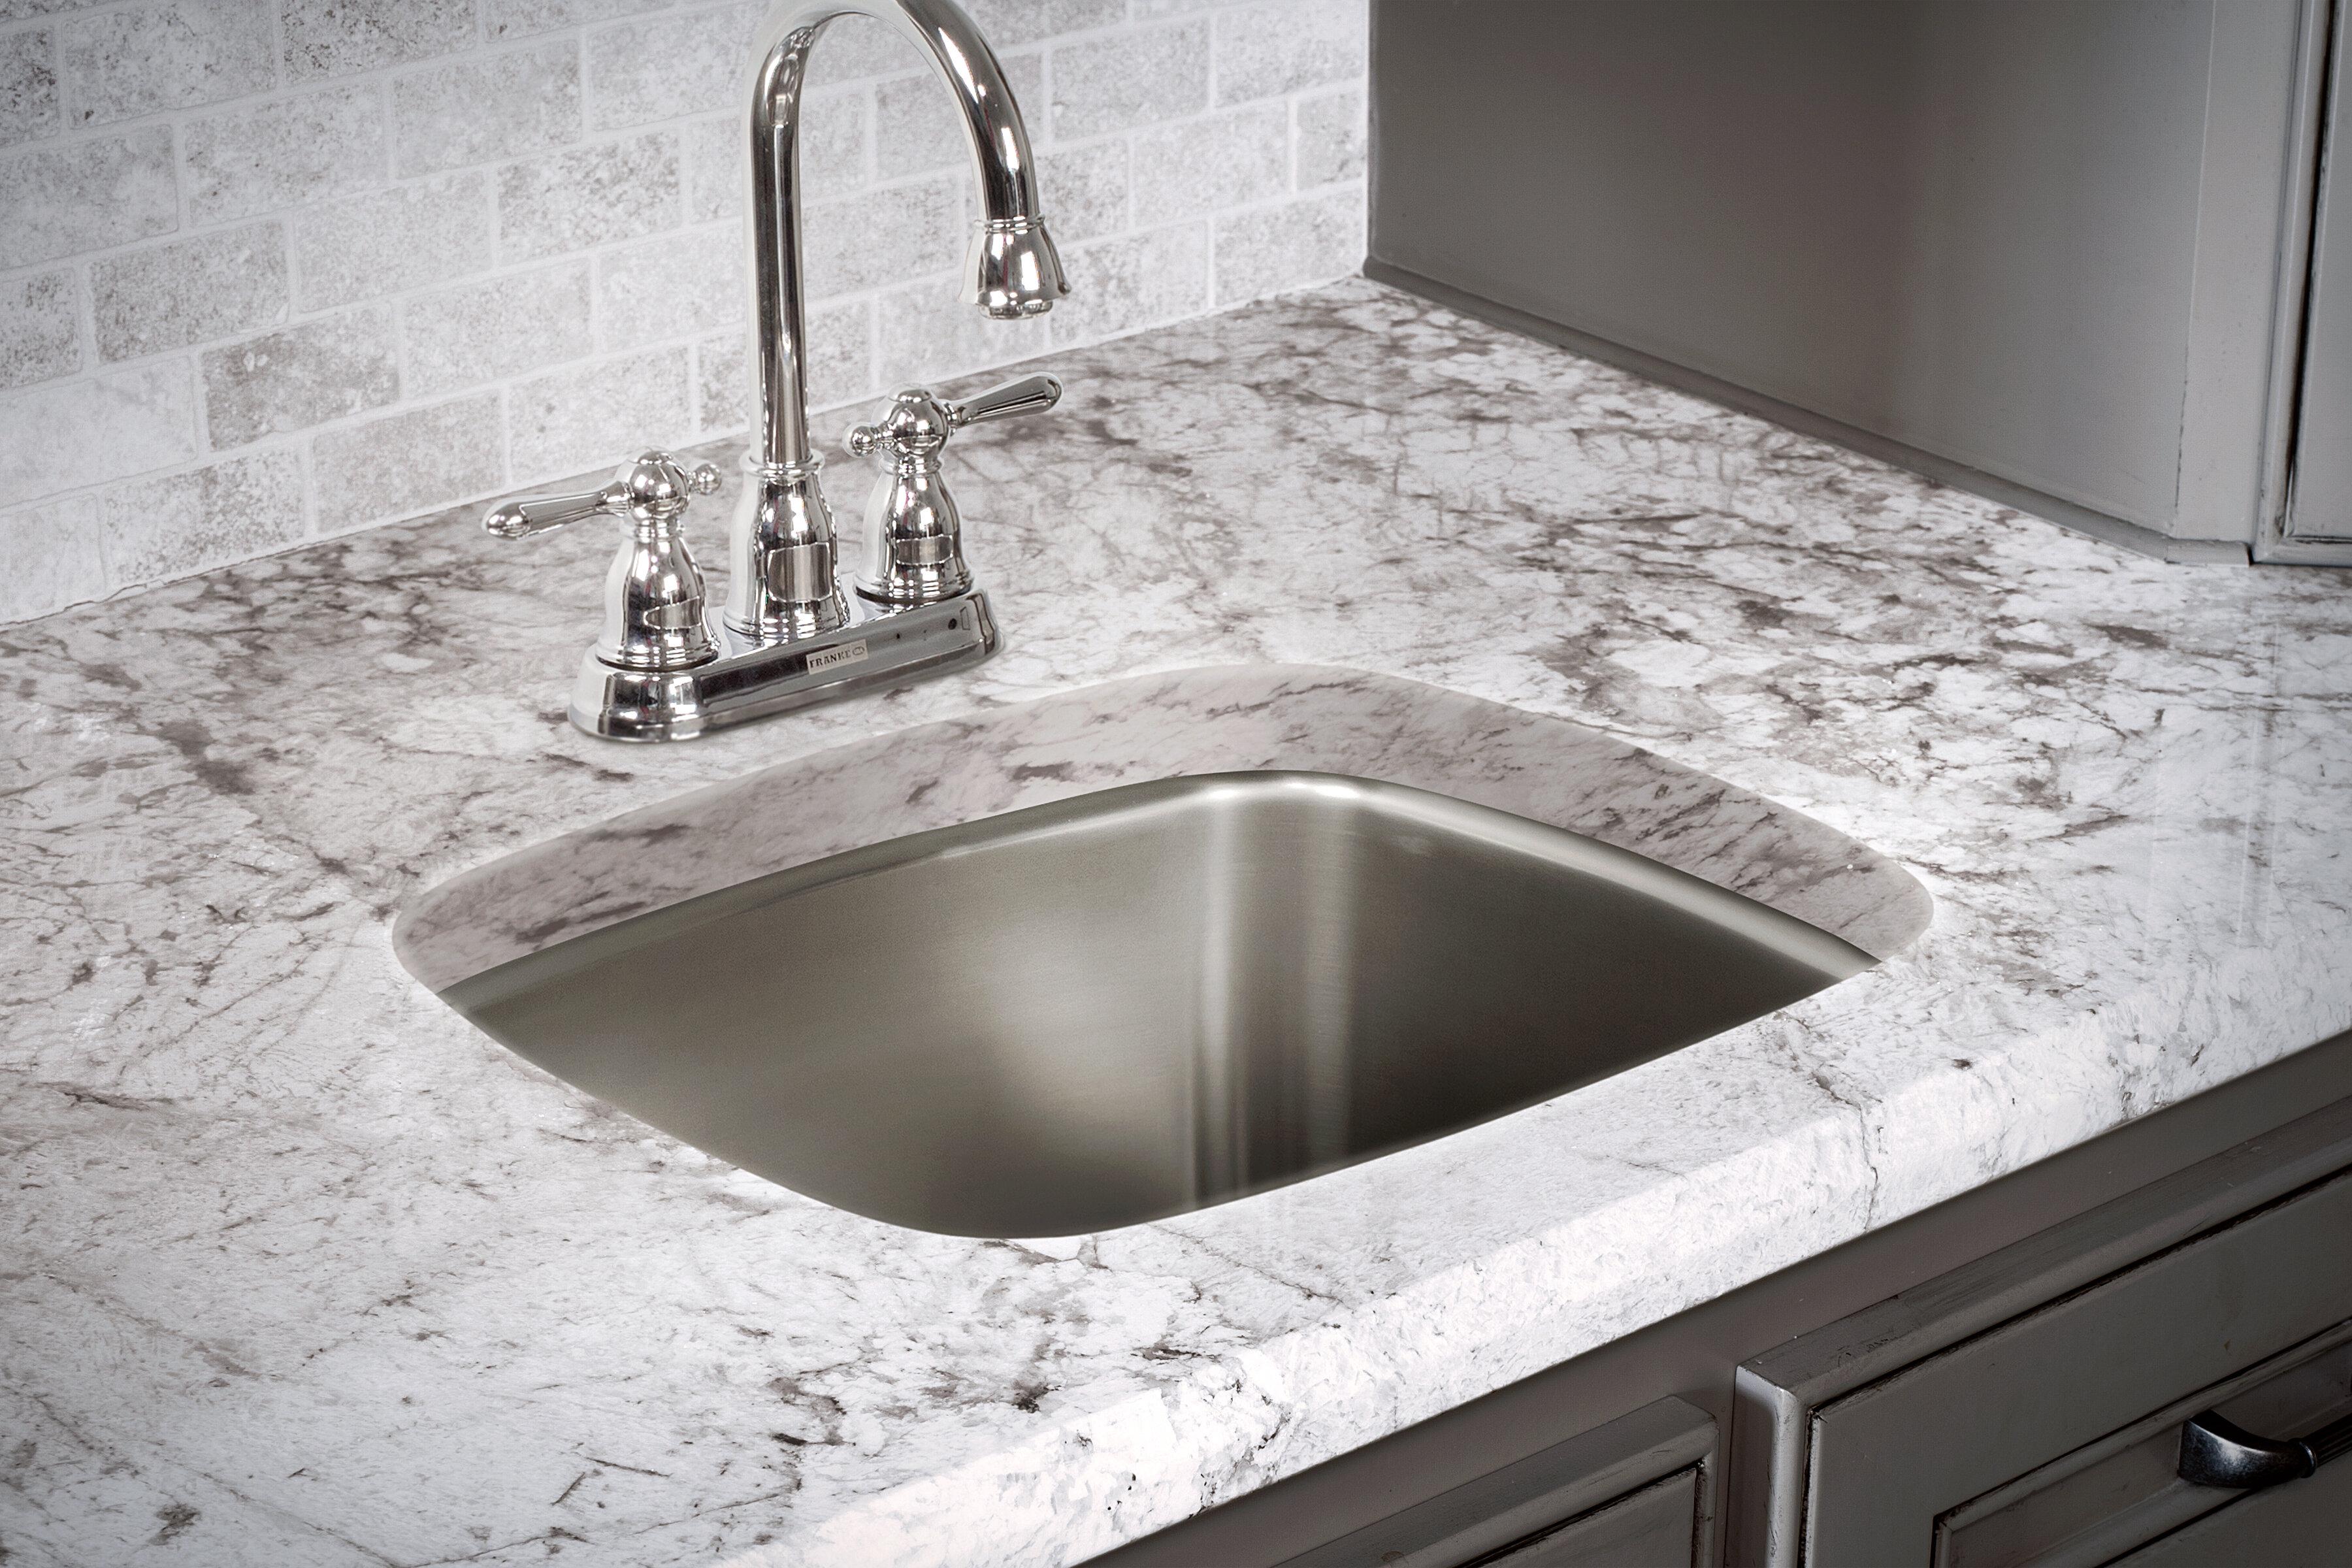 Sl103bx Axis 20 13 X 56 Undermount Laundry Sink